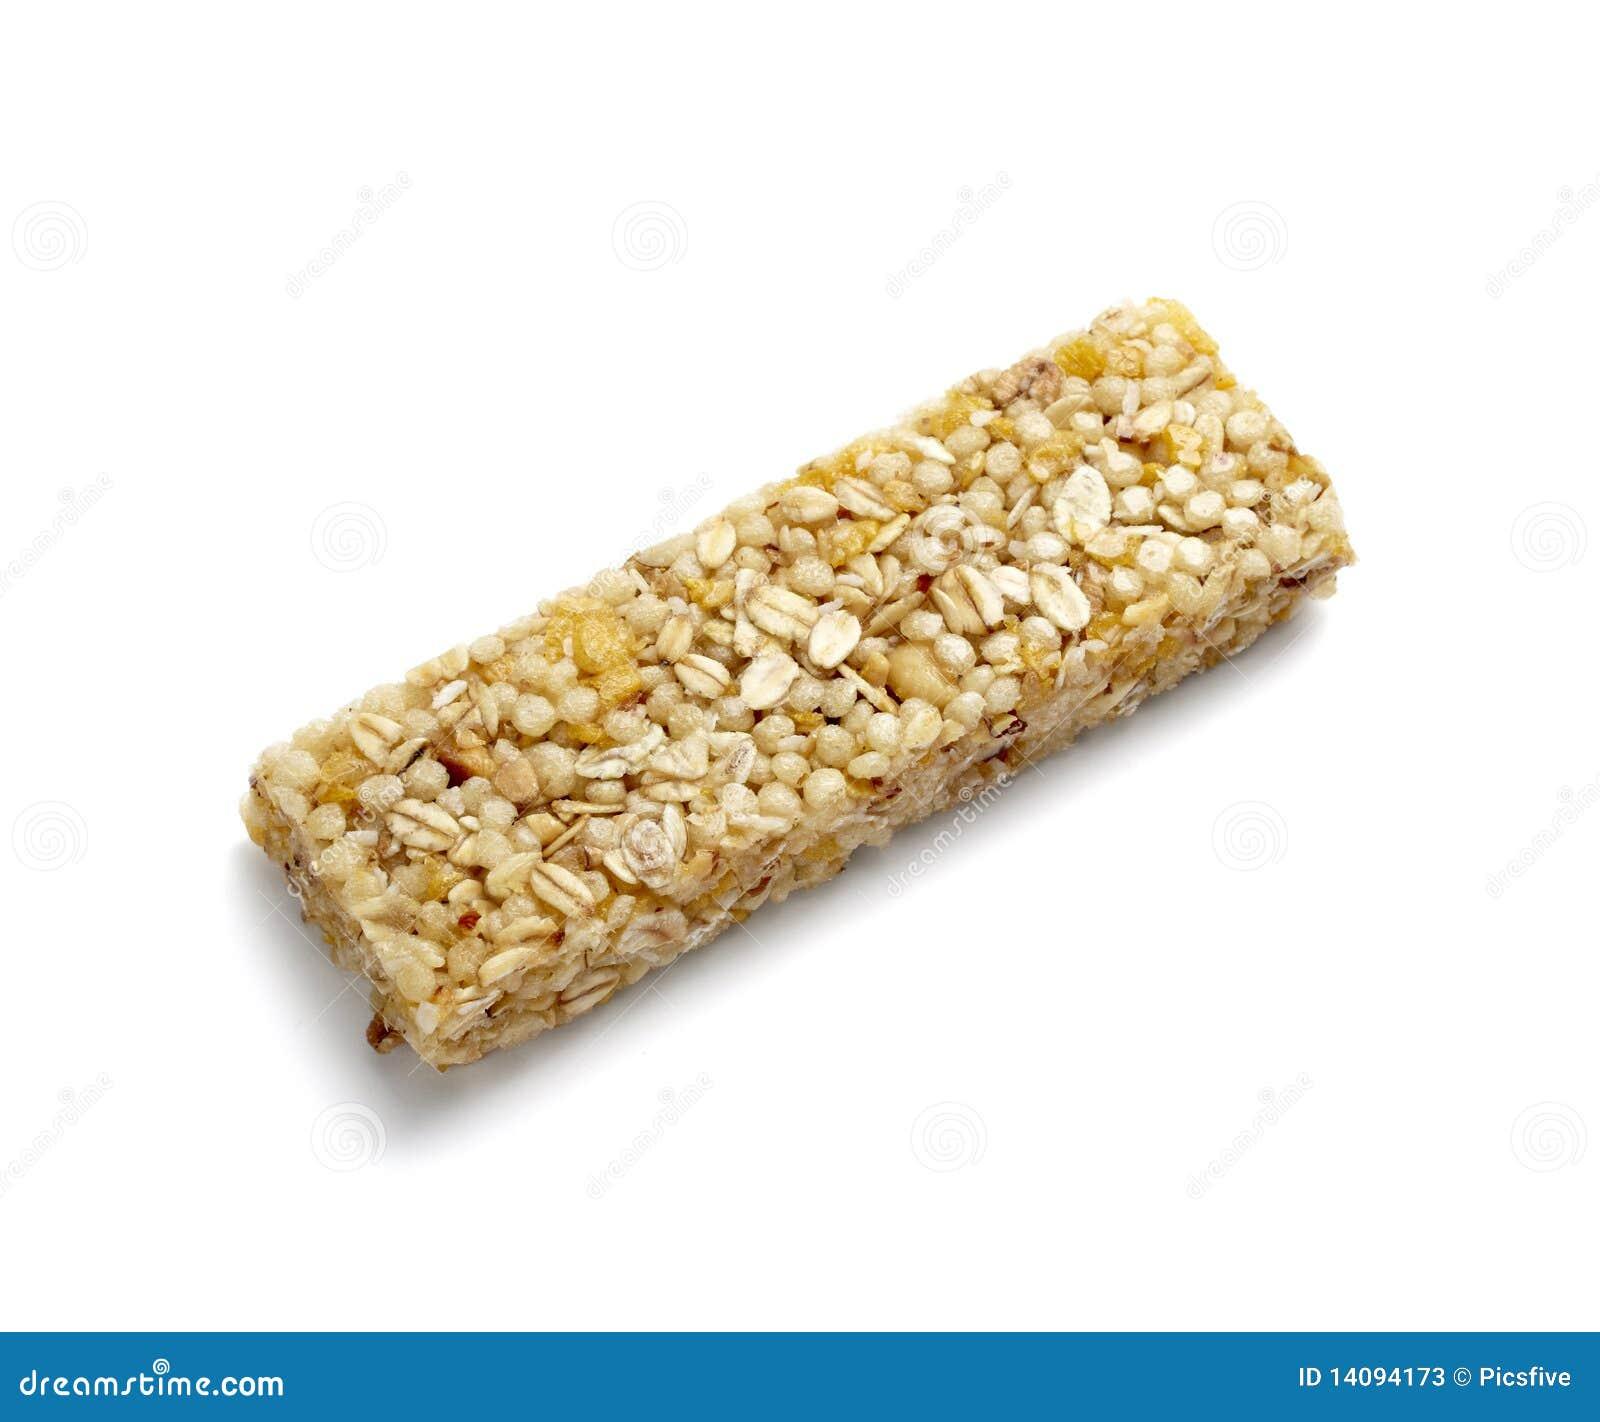 Muesli bar cereals food healthy nutrition stock image for Food bar health